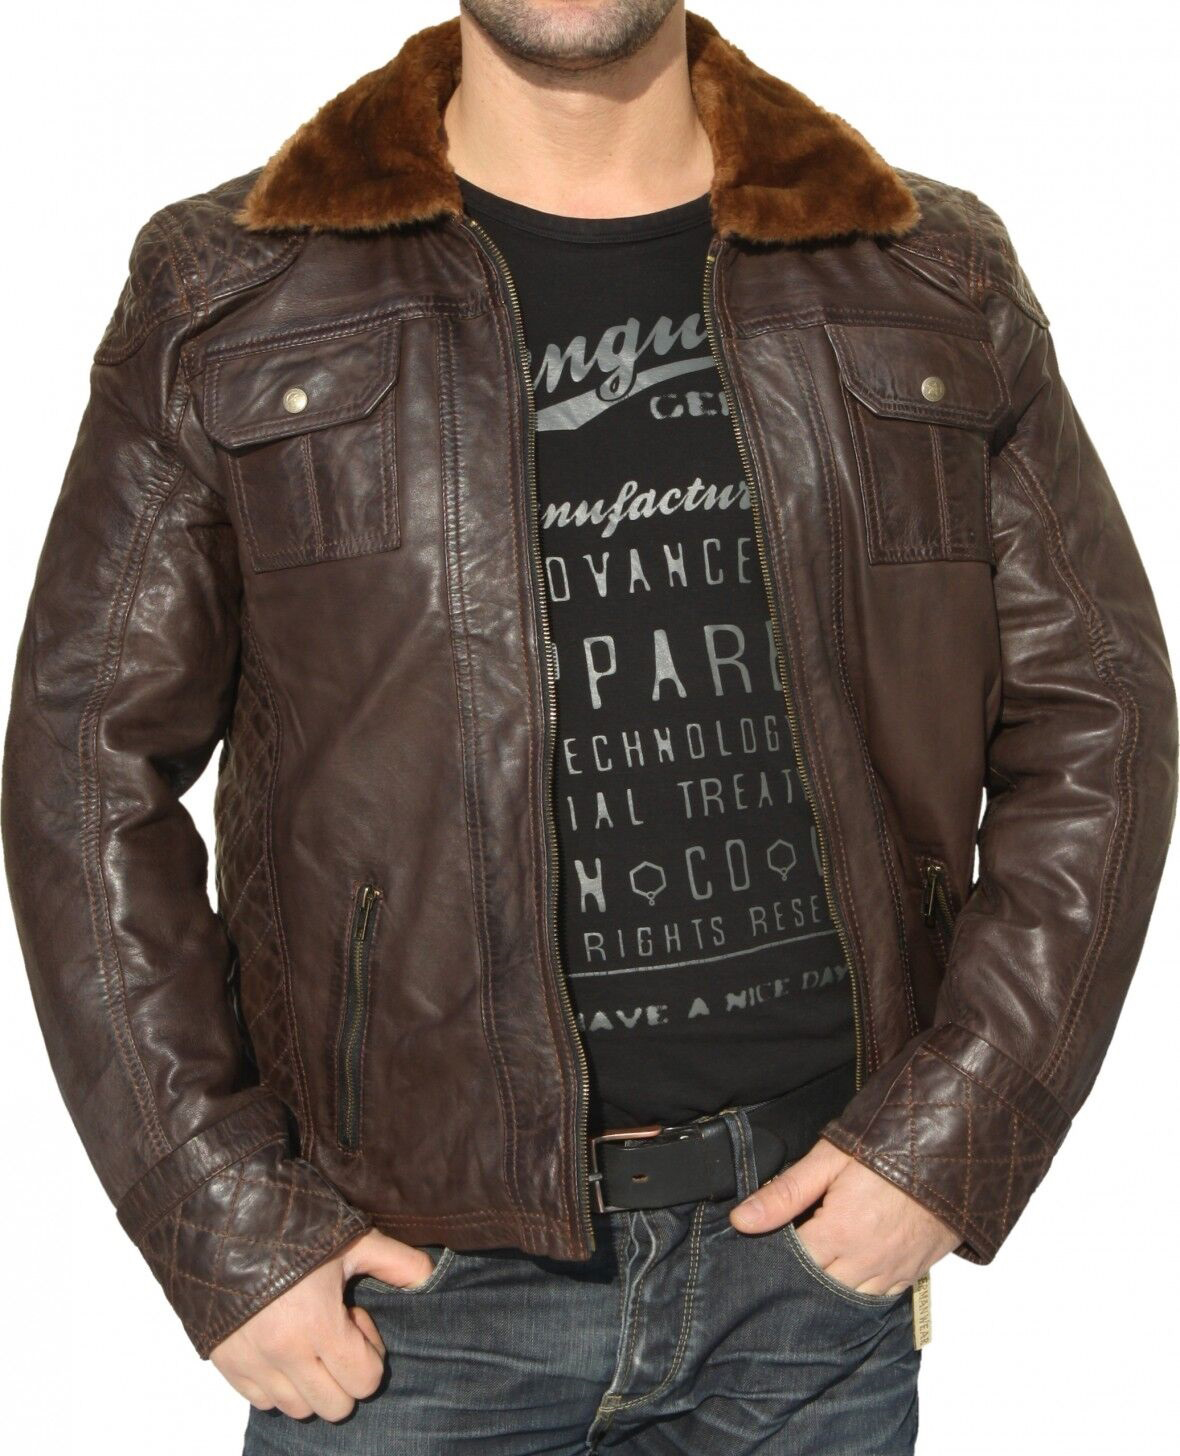 Herren Lederjacke Jacke aus Lamm Nappa Leder Braun Pelzkragen 48 - 60 / M - 5 XL